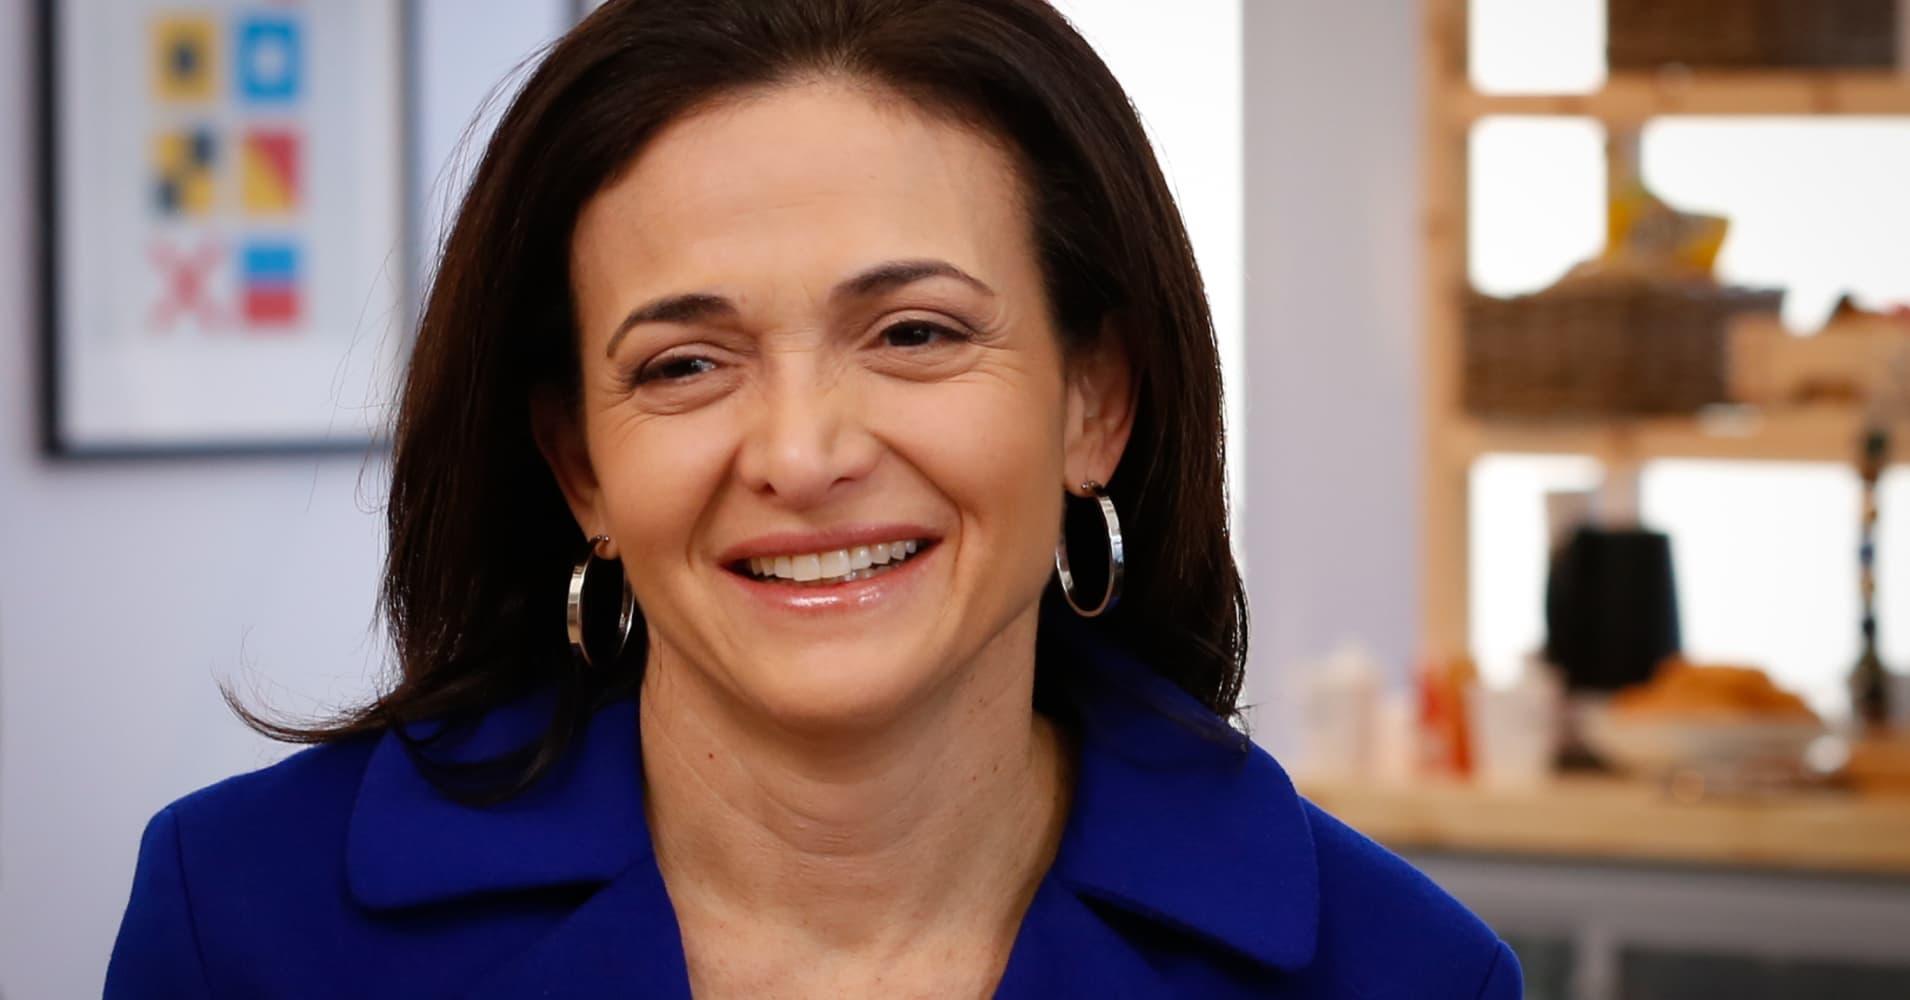 Facebook's Sheryl Sandberg responds to New York Times investigation